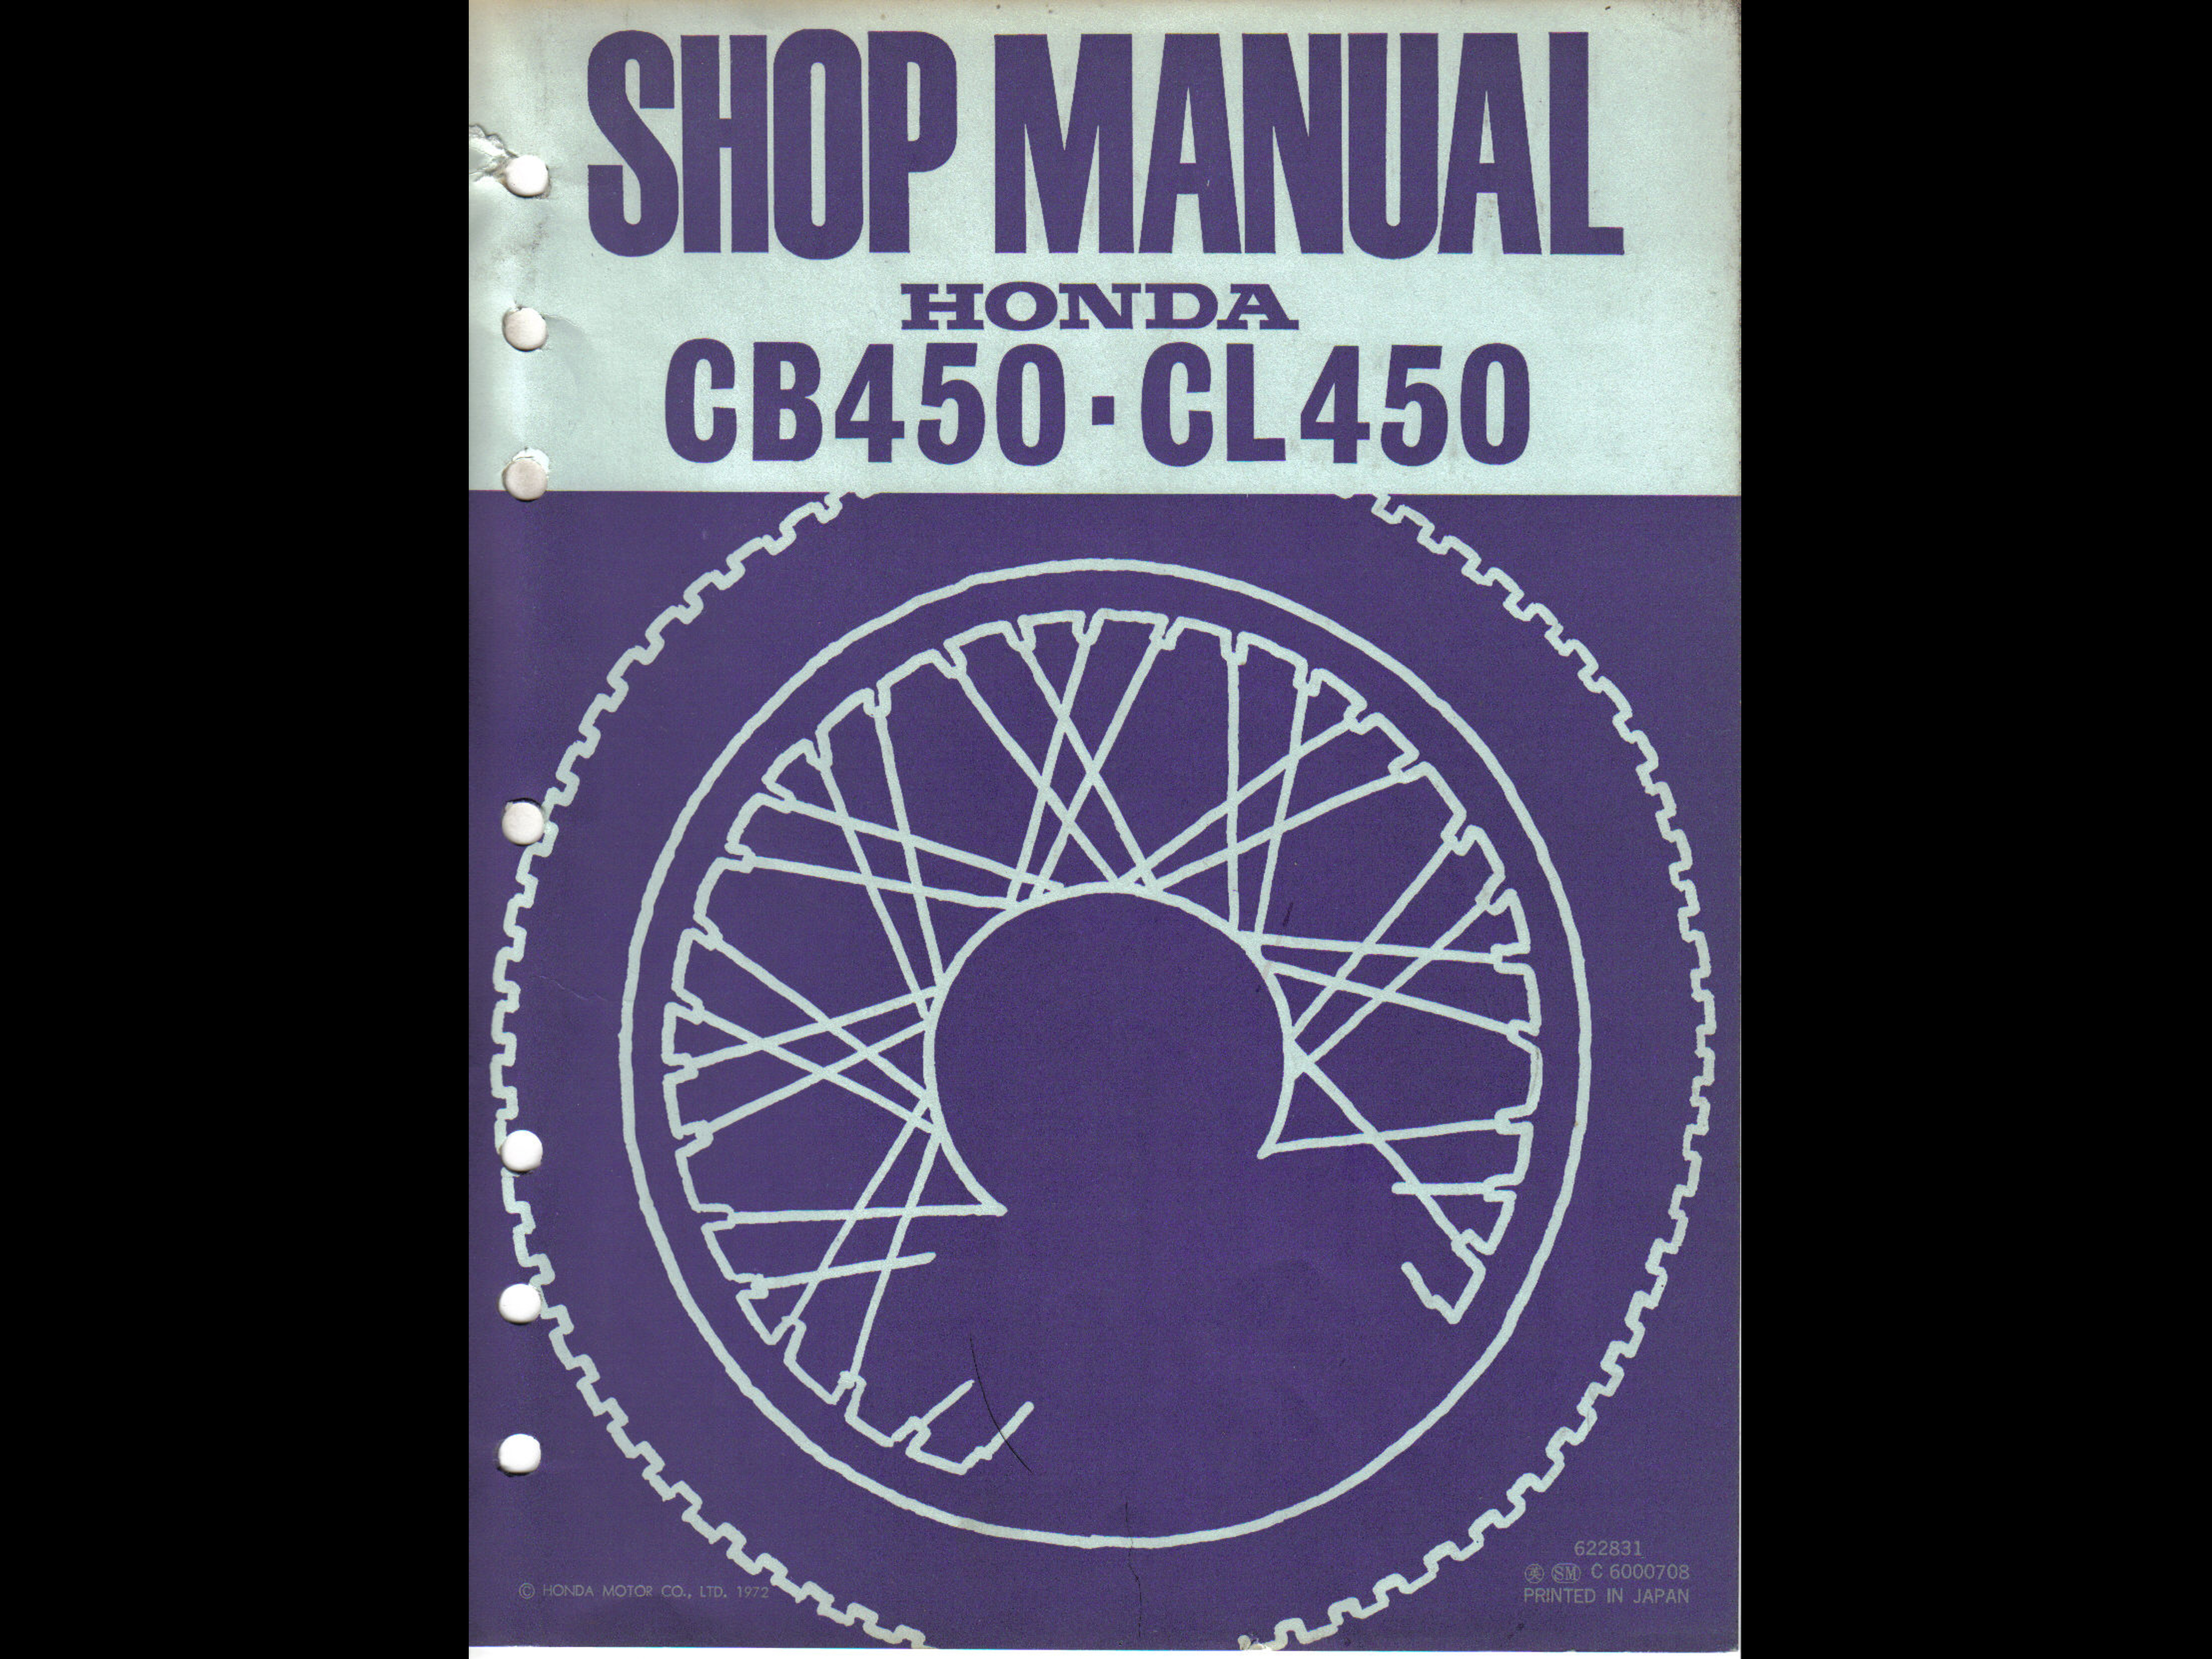 Workshop Manual for Honda CB450 K1-K7 (1972)